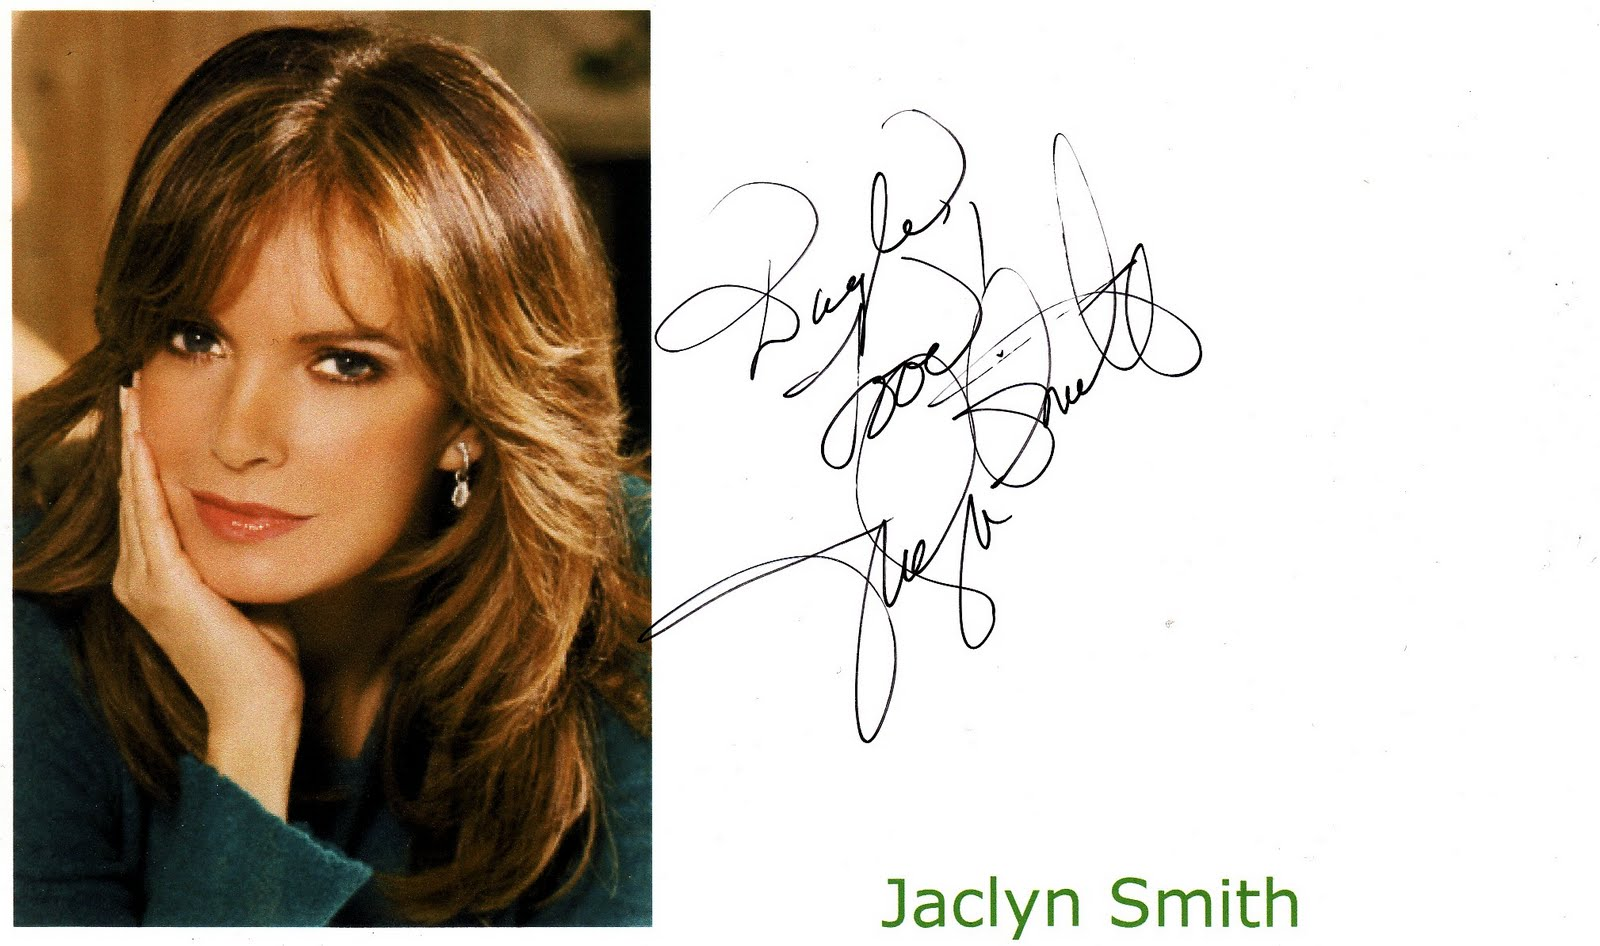 http://3.bp.blogspot.com/_hR6CjJzjzBA/S-WjnxpUiNI/AAAAAAAABj0/sOdDjrqKaDs/s1600/JaclynSmith.jpg